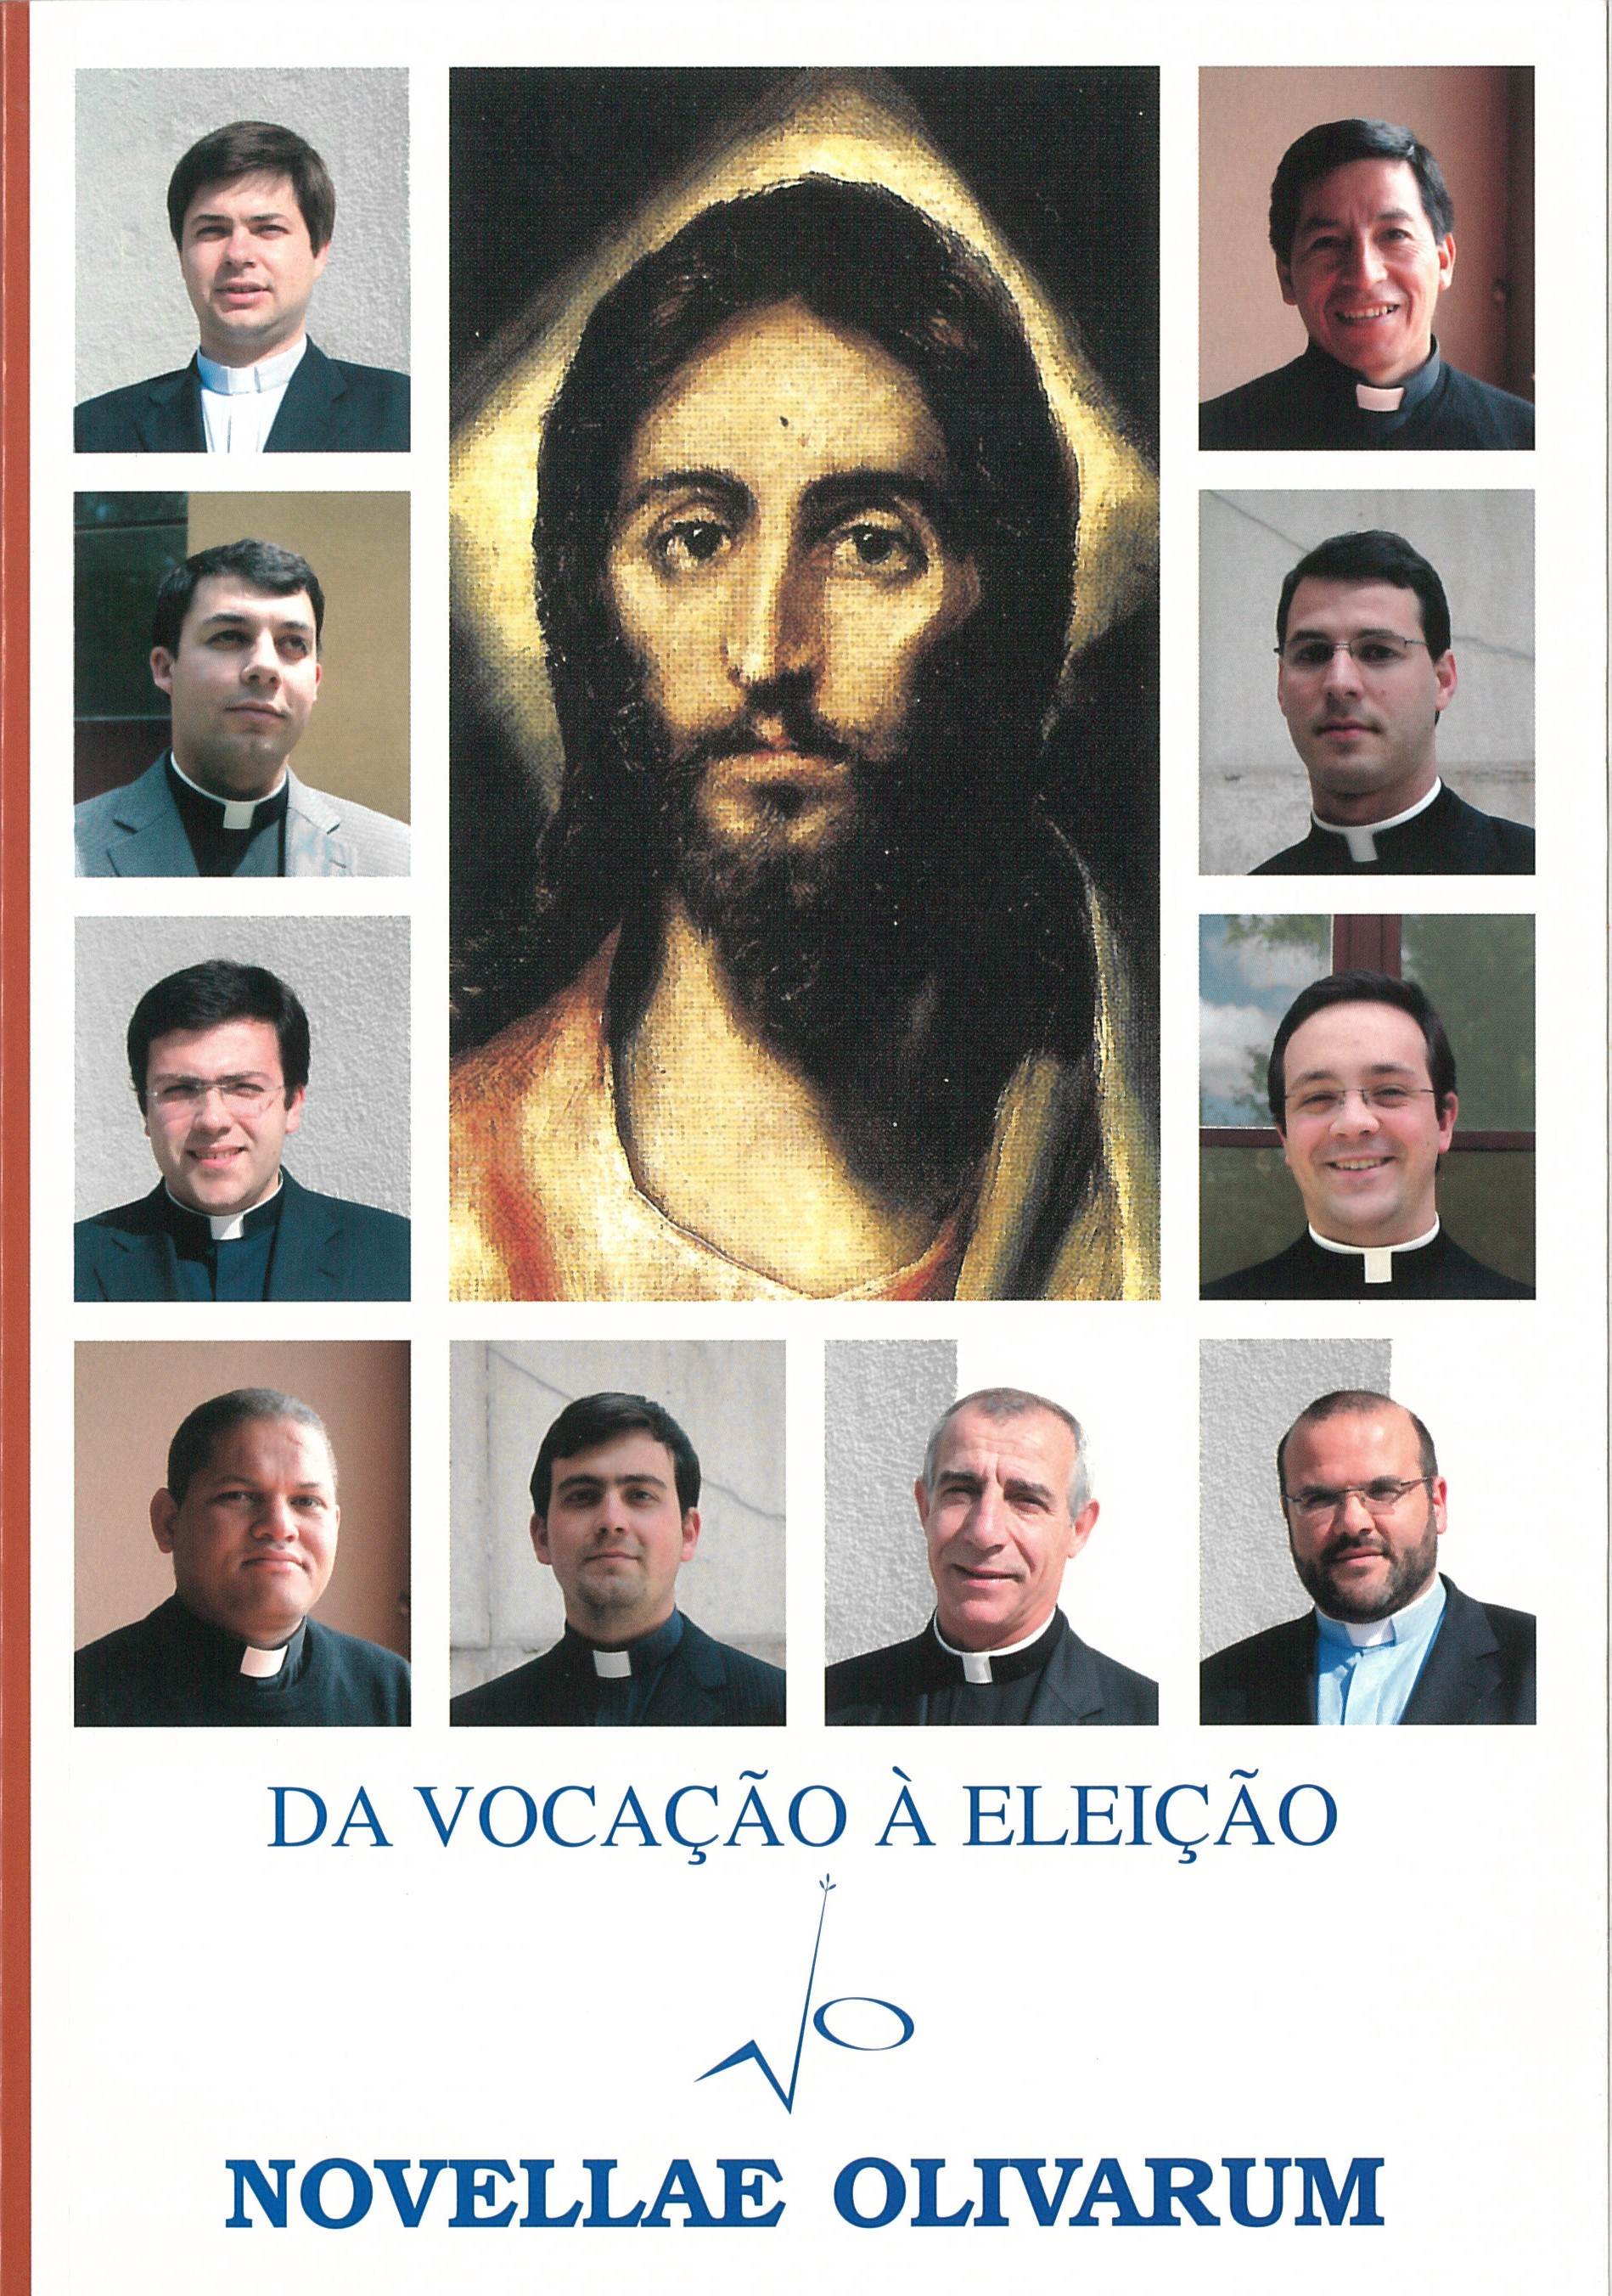 Revista Novellae Olivarum, nº 36 - Junho de 2008 (capa)